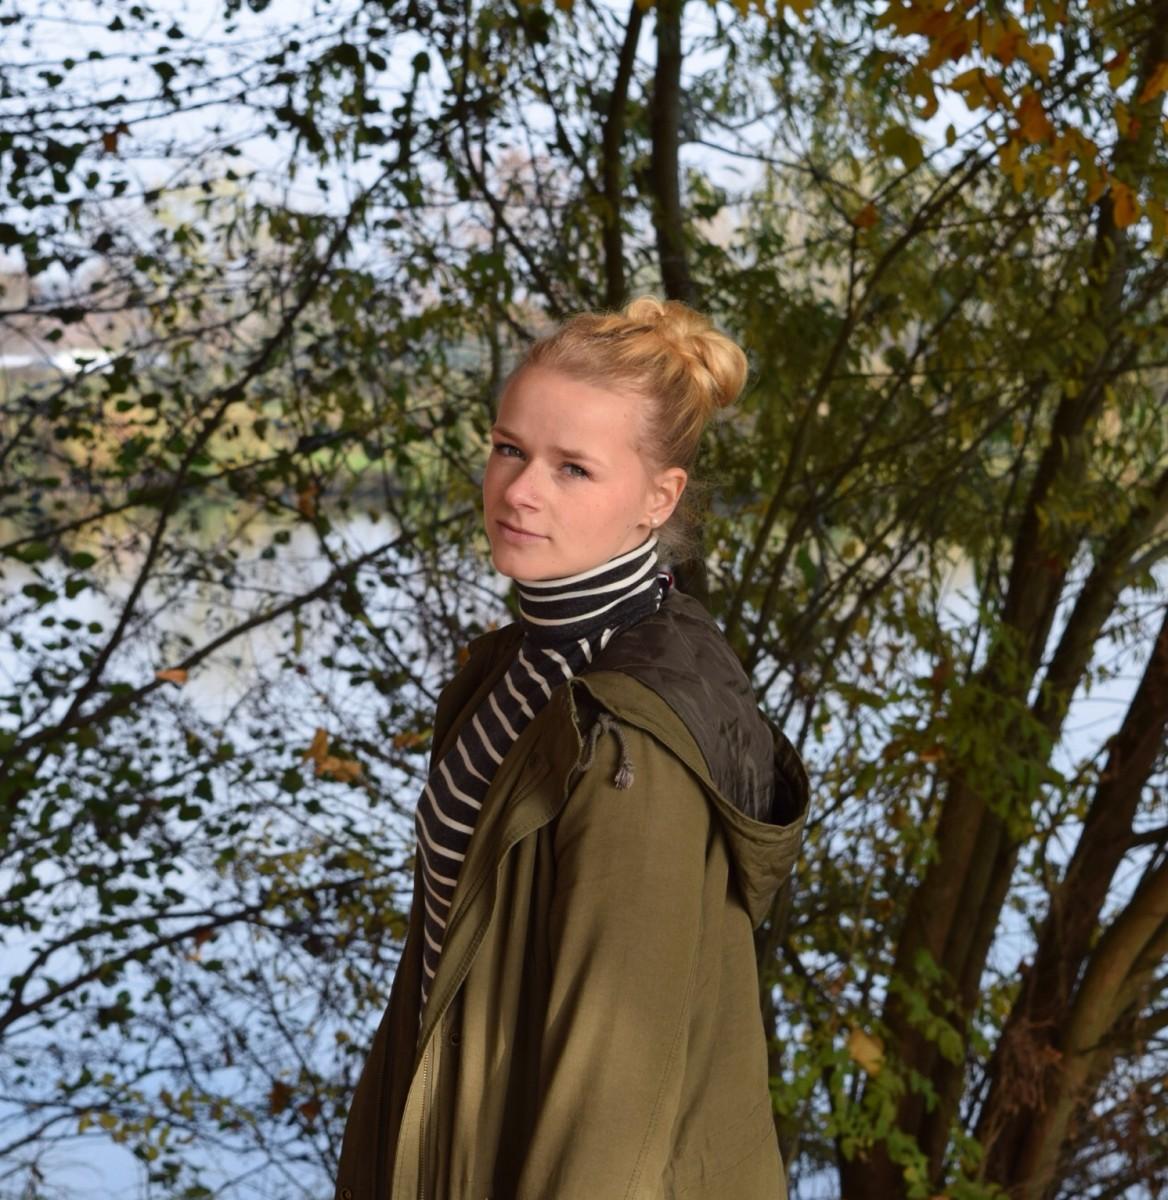 blonde-haare-herbst-blätter-grüner-parka-gestreifter-rollkragenpullover